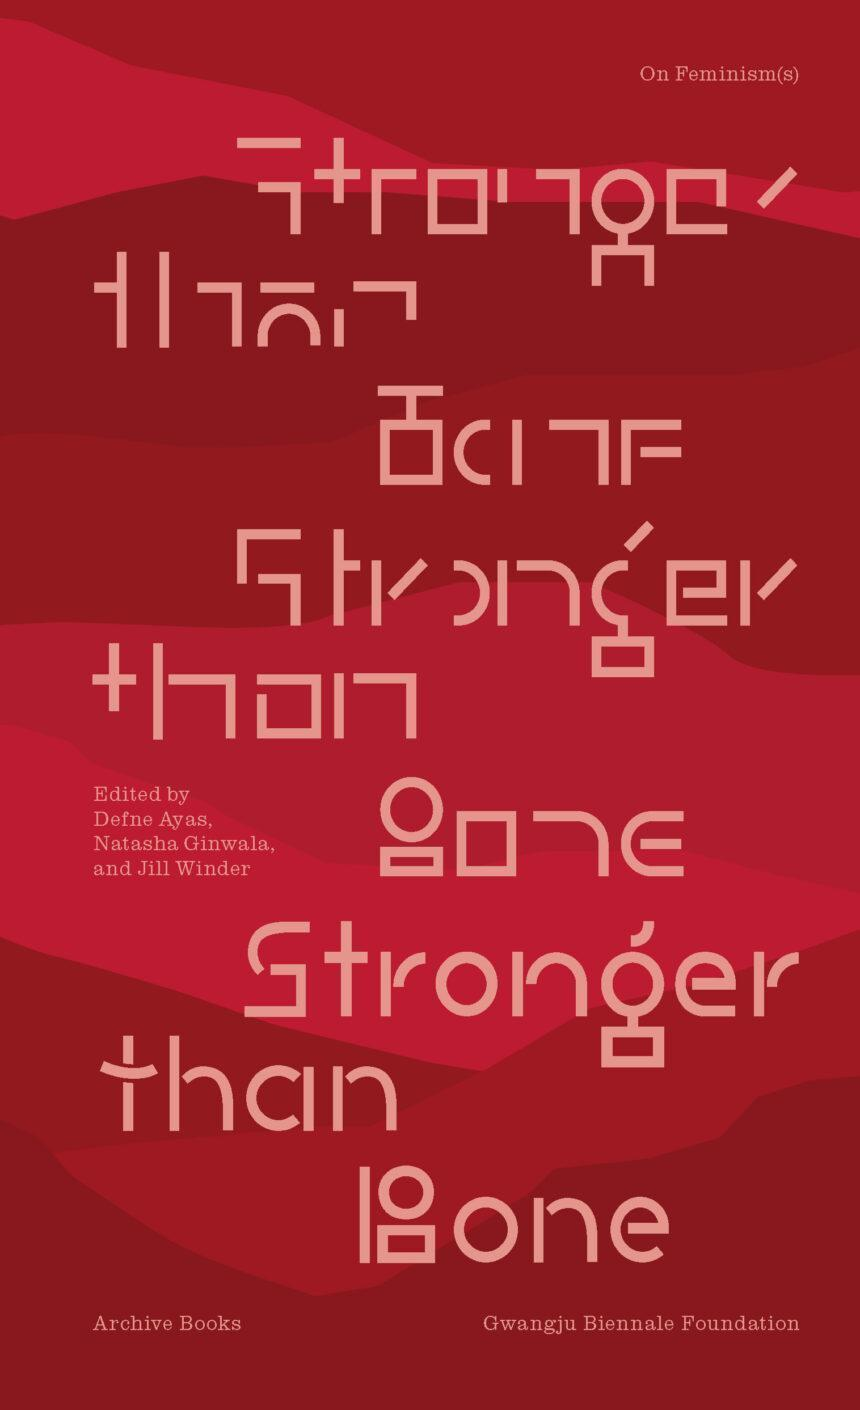 Stronger Than Bone